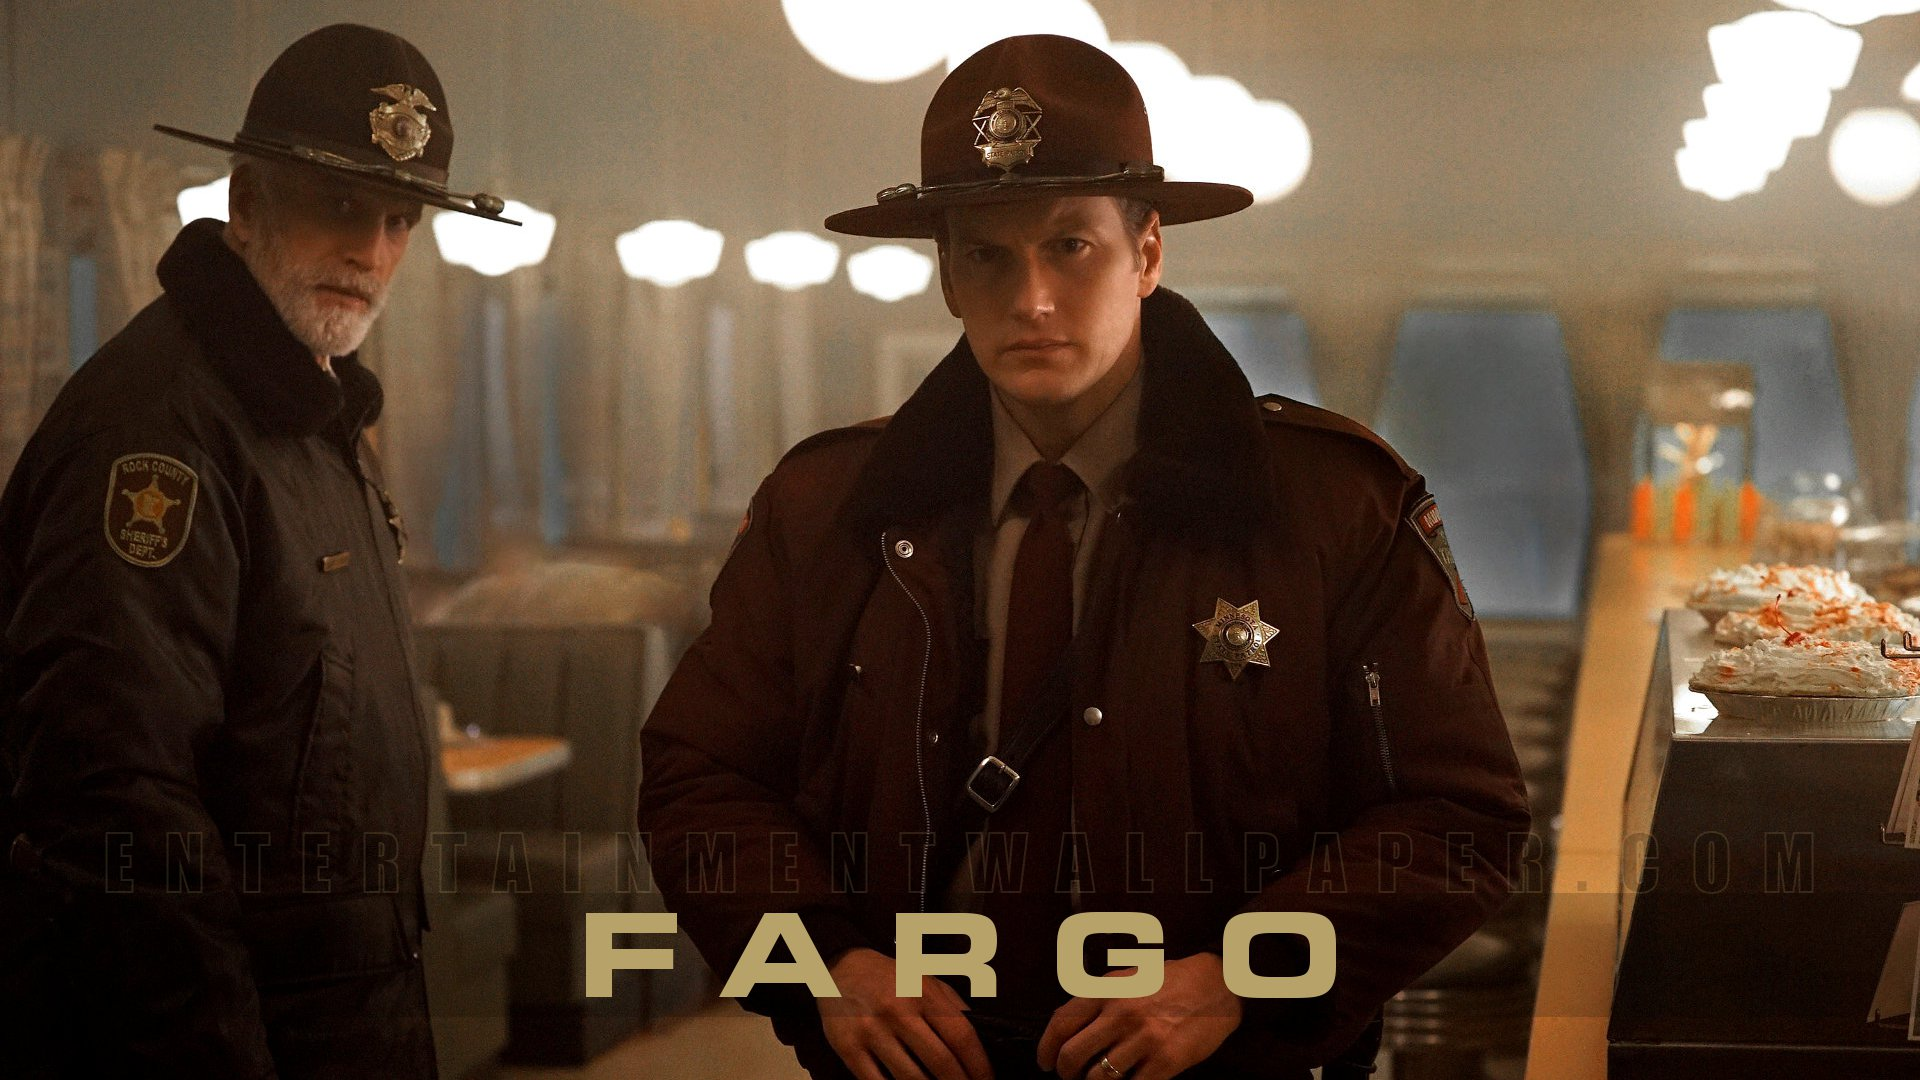 Fargo Season 2 Wallpapers